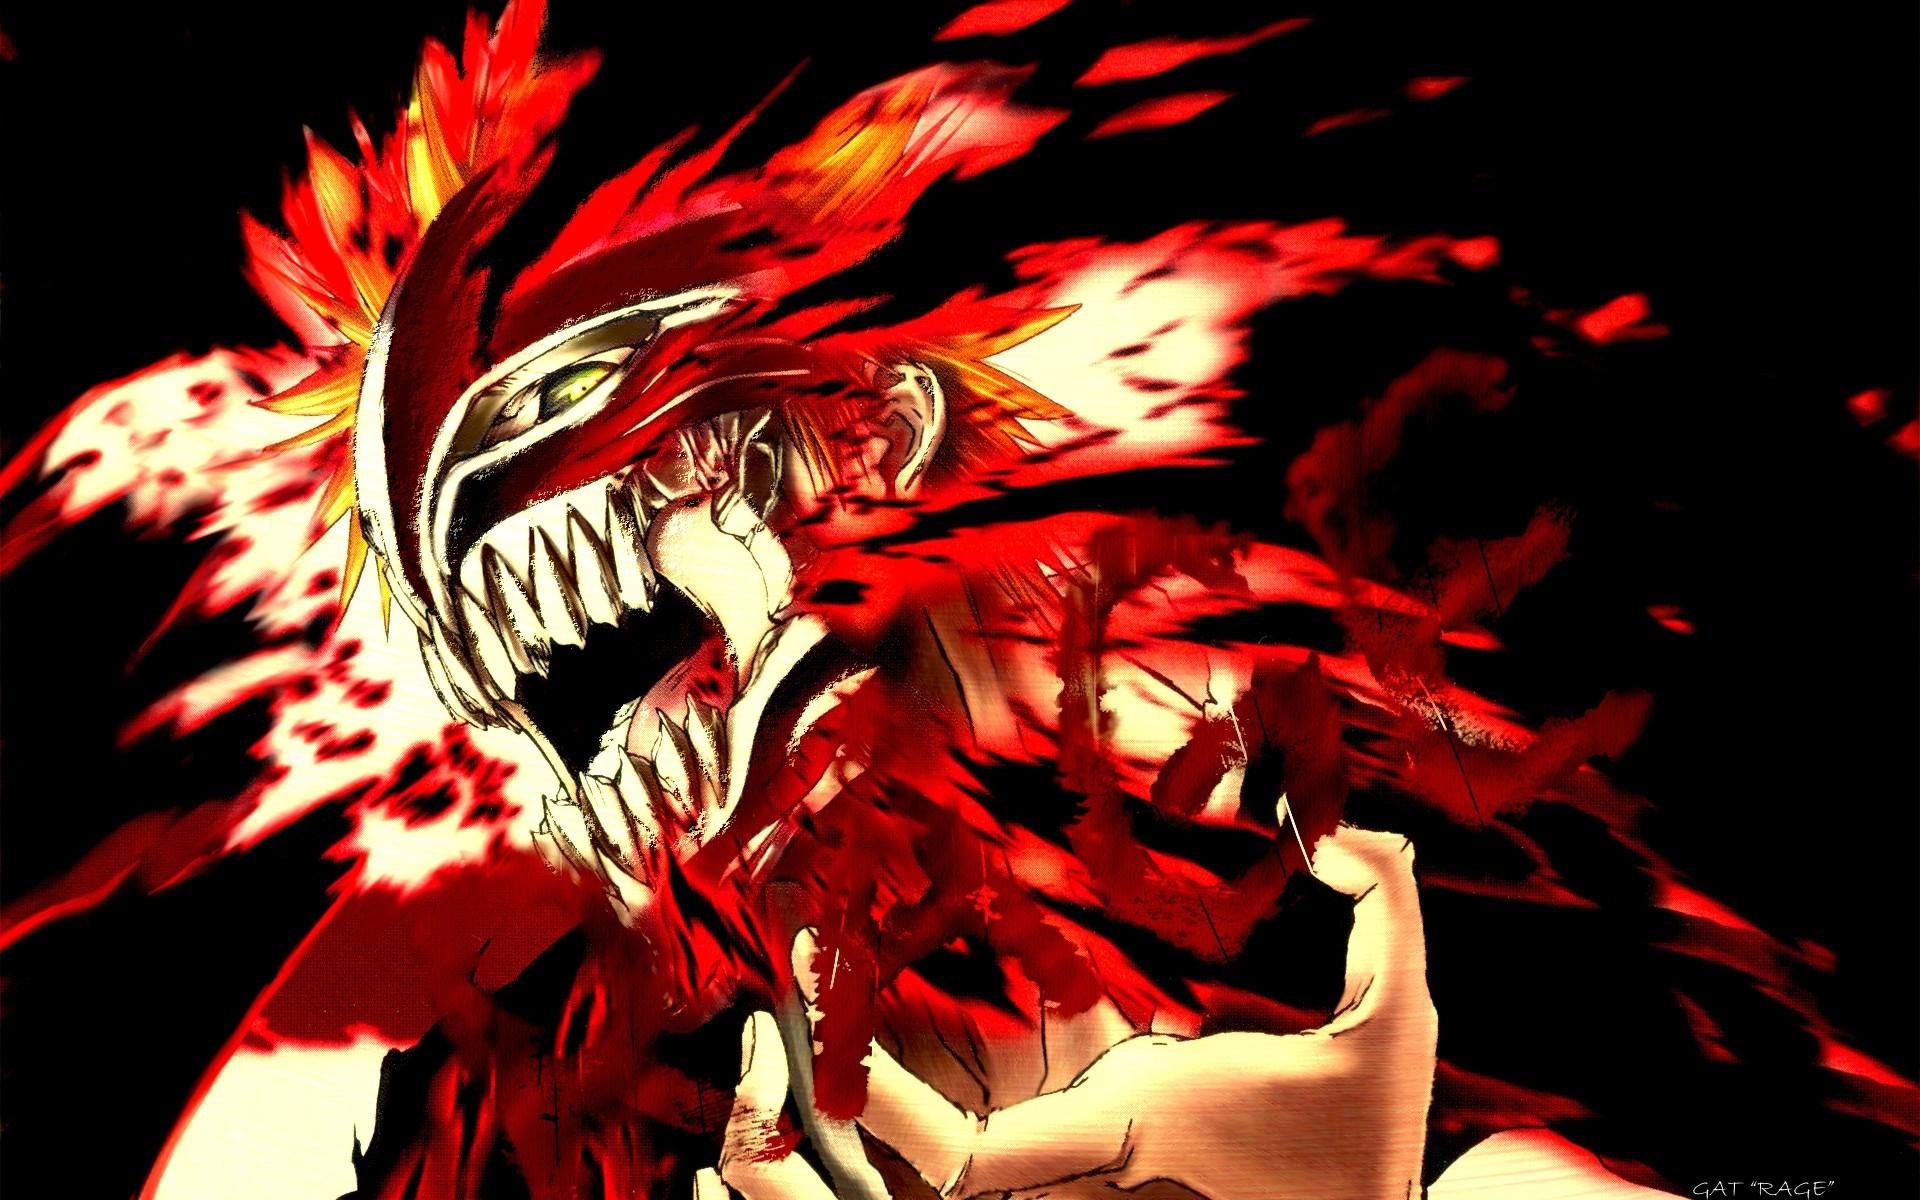 Anime Bleach Ichigo Hollow Mask Read High Quality Bleach Manga on  MangaGrounds | Bleach Forums and